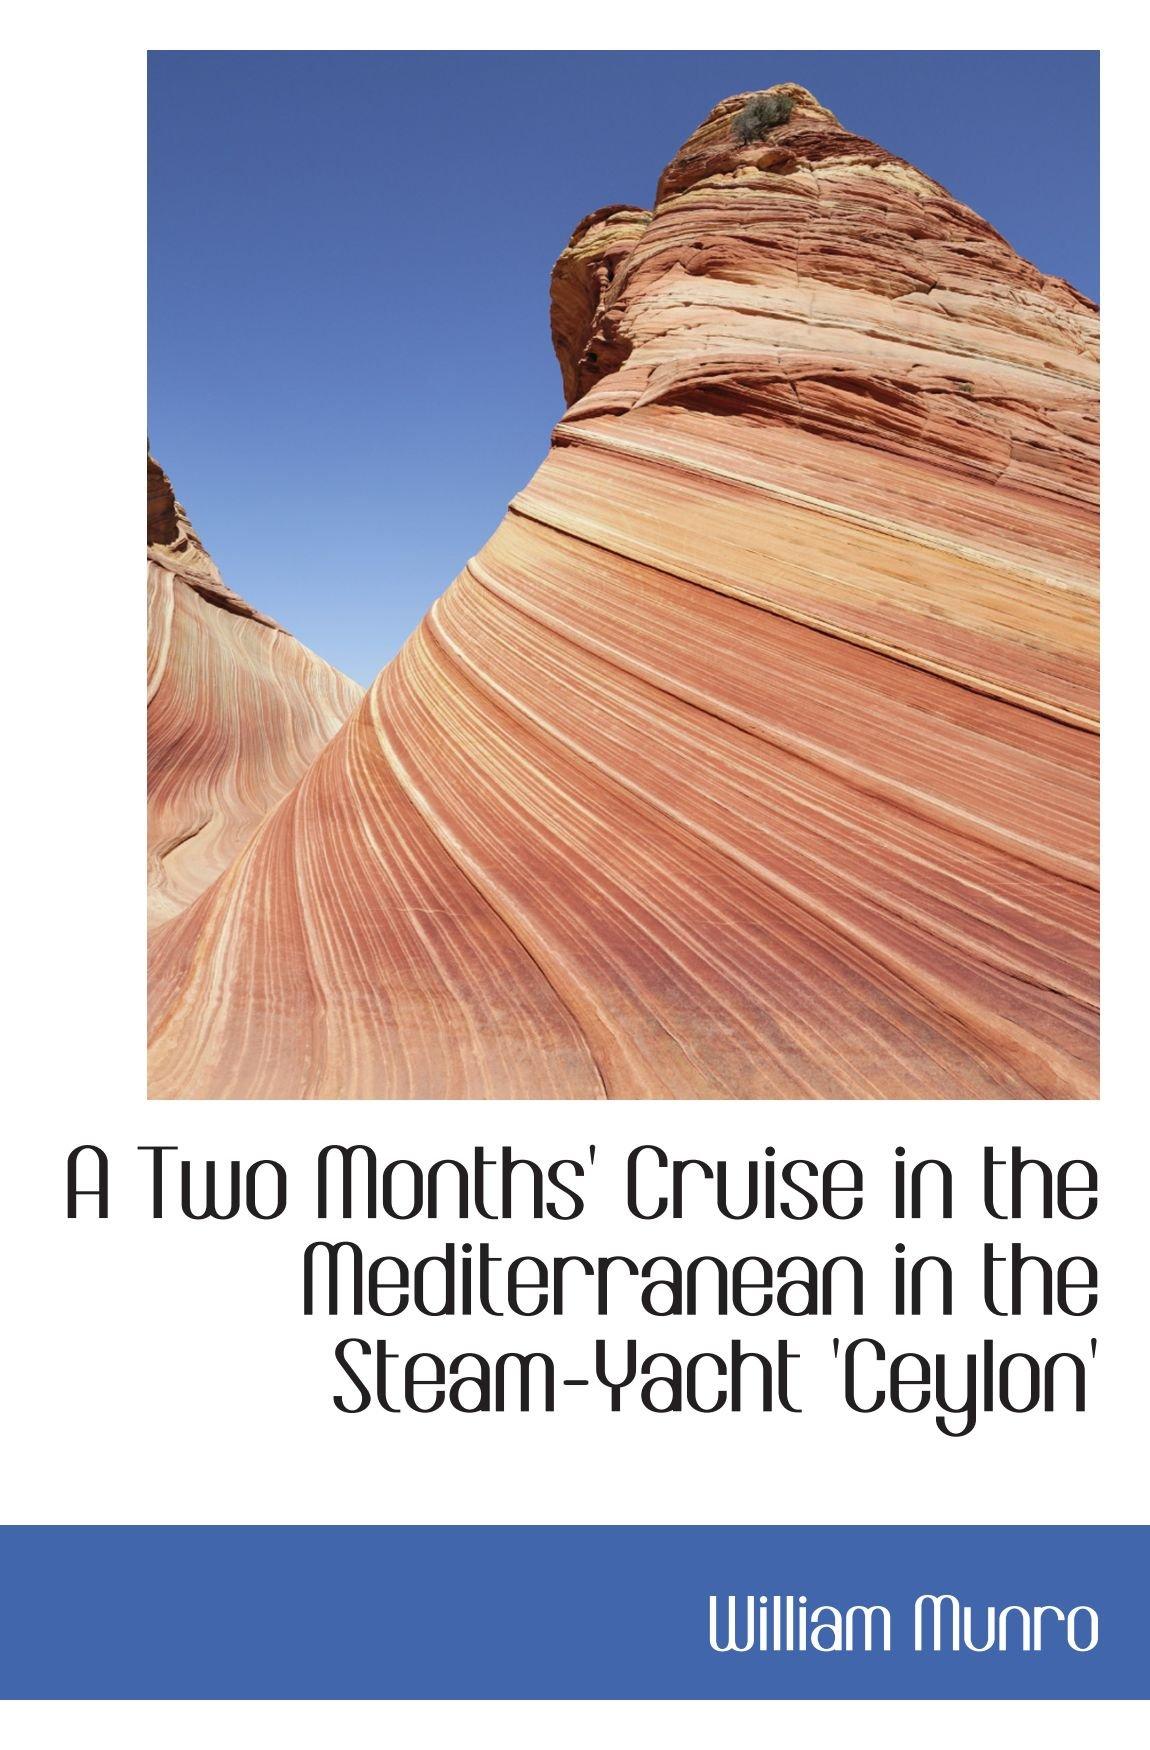 A Two Months' Cruise in the Mediterranean in the Steam-Yacht 'Ceylon' ebook